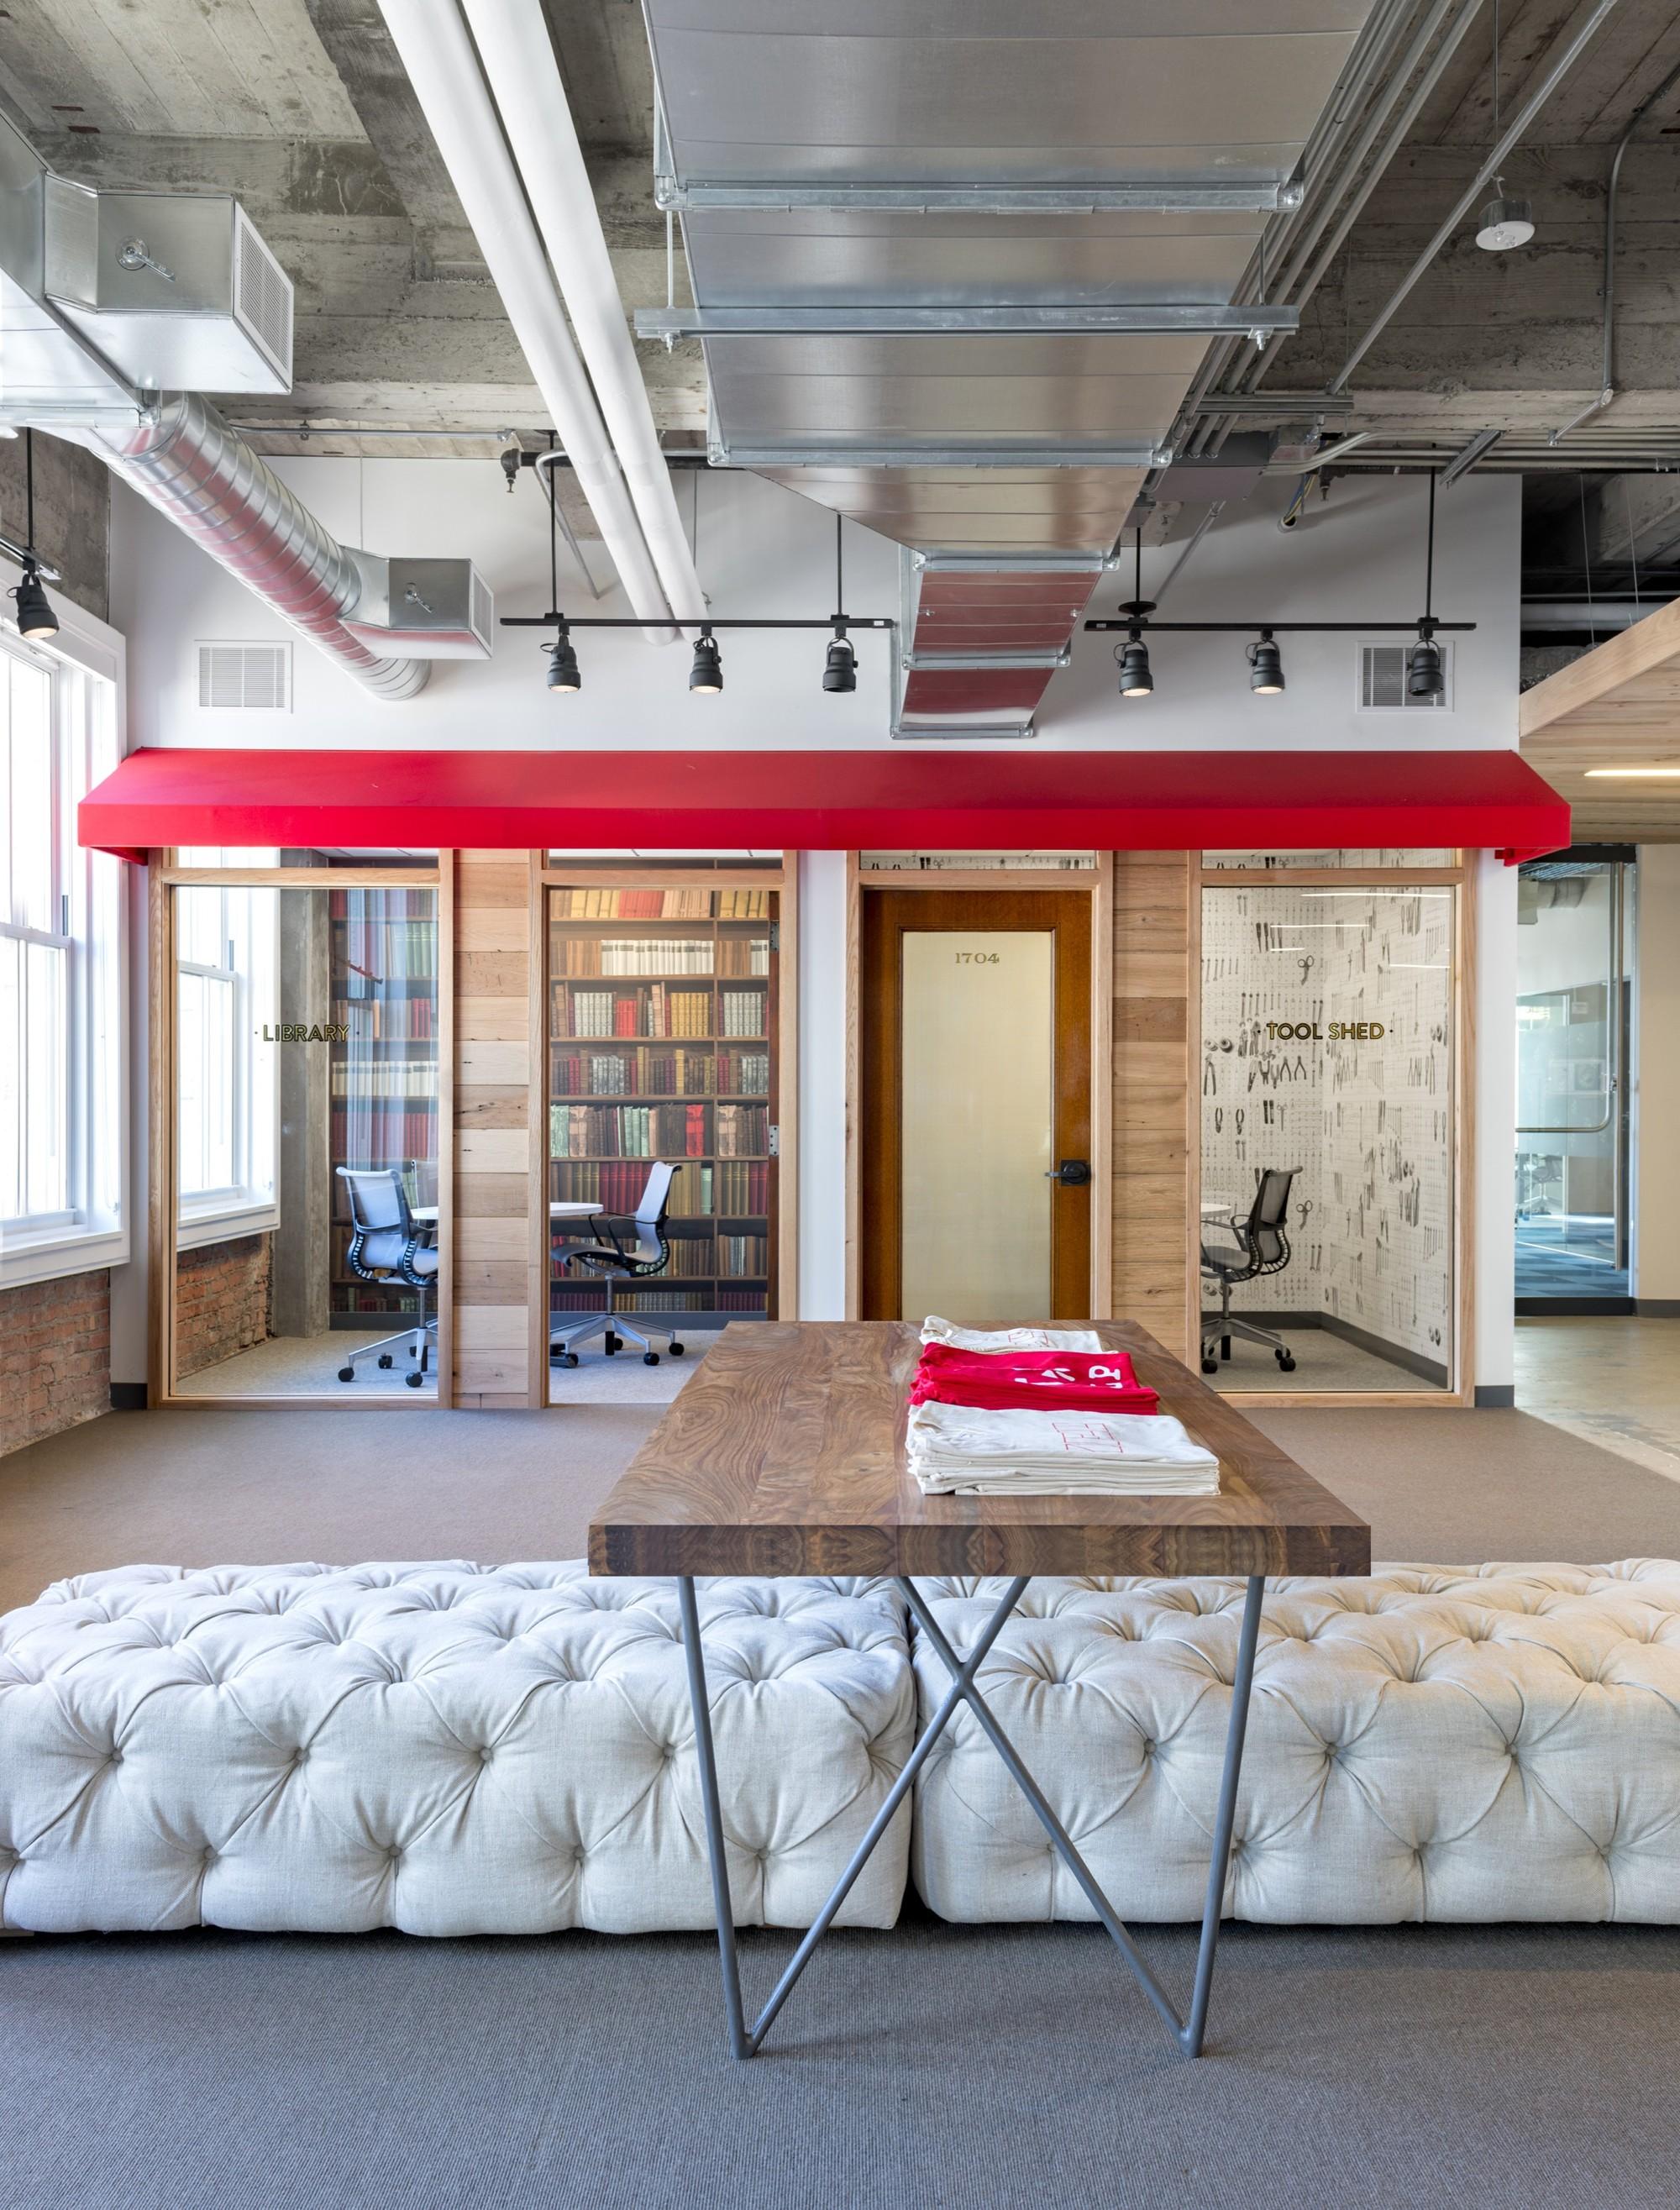 Gallery of Yelp Headquarters Studio OA 13